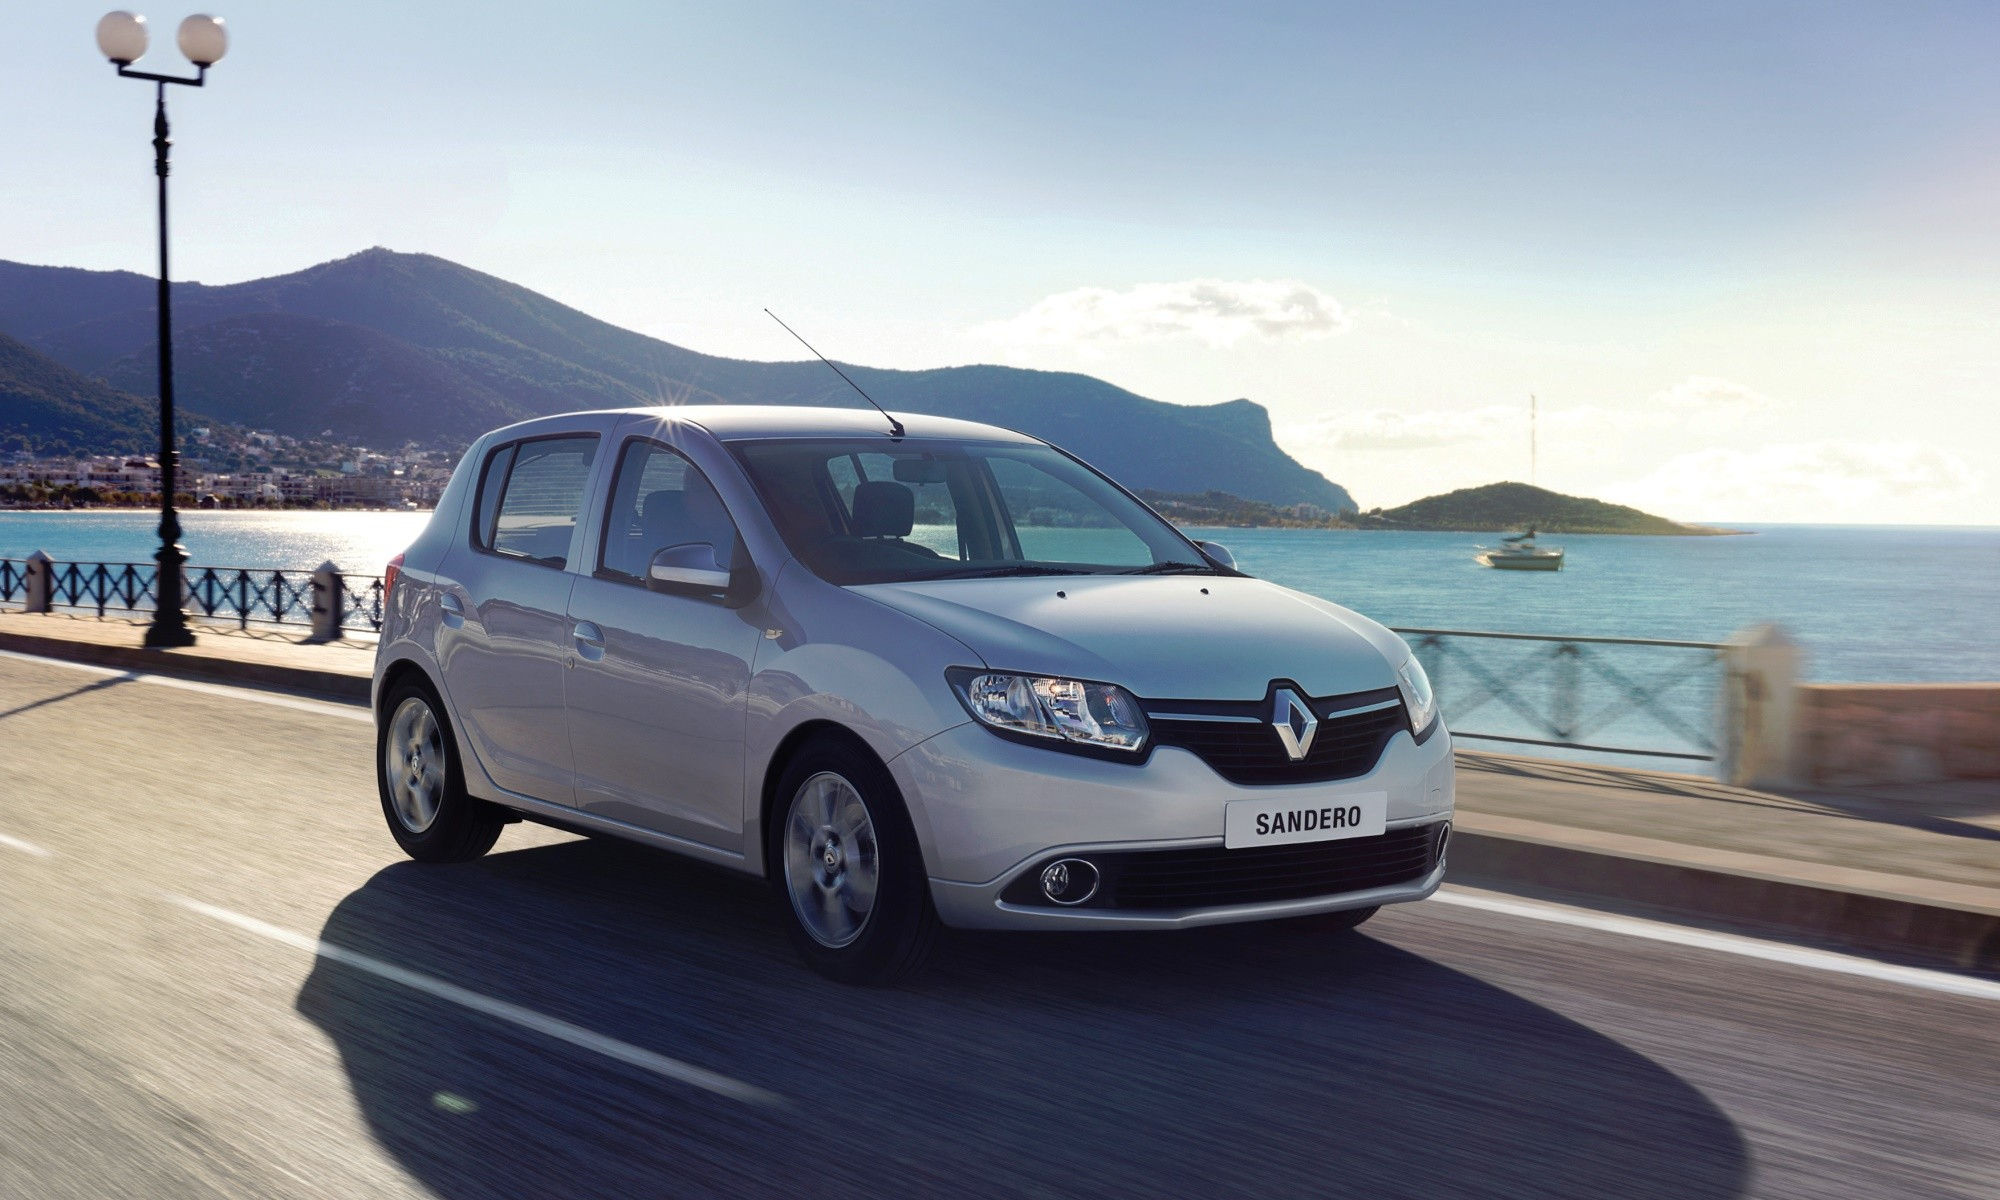 Renault Sandero Turbo Dynamique